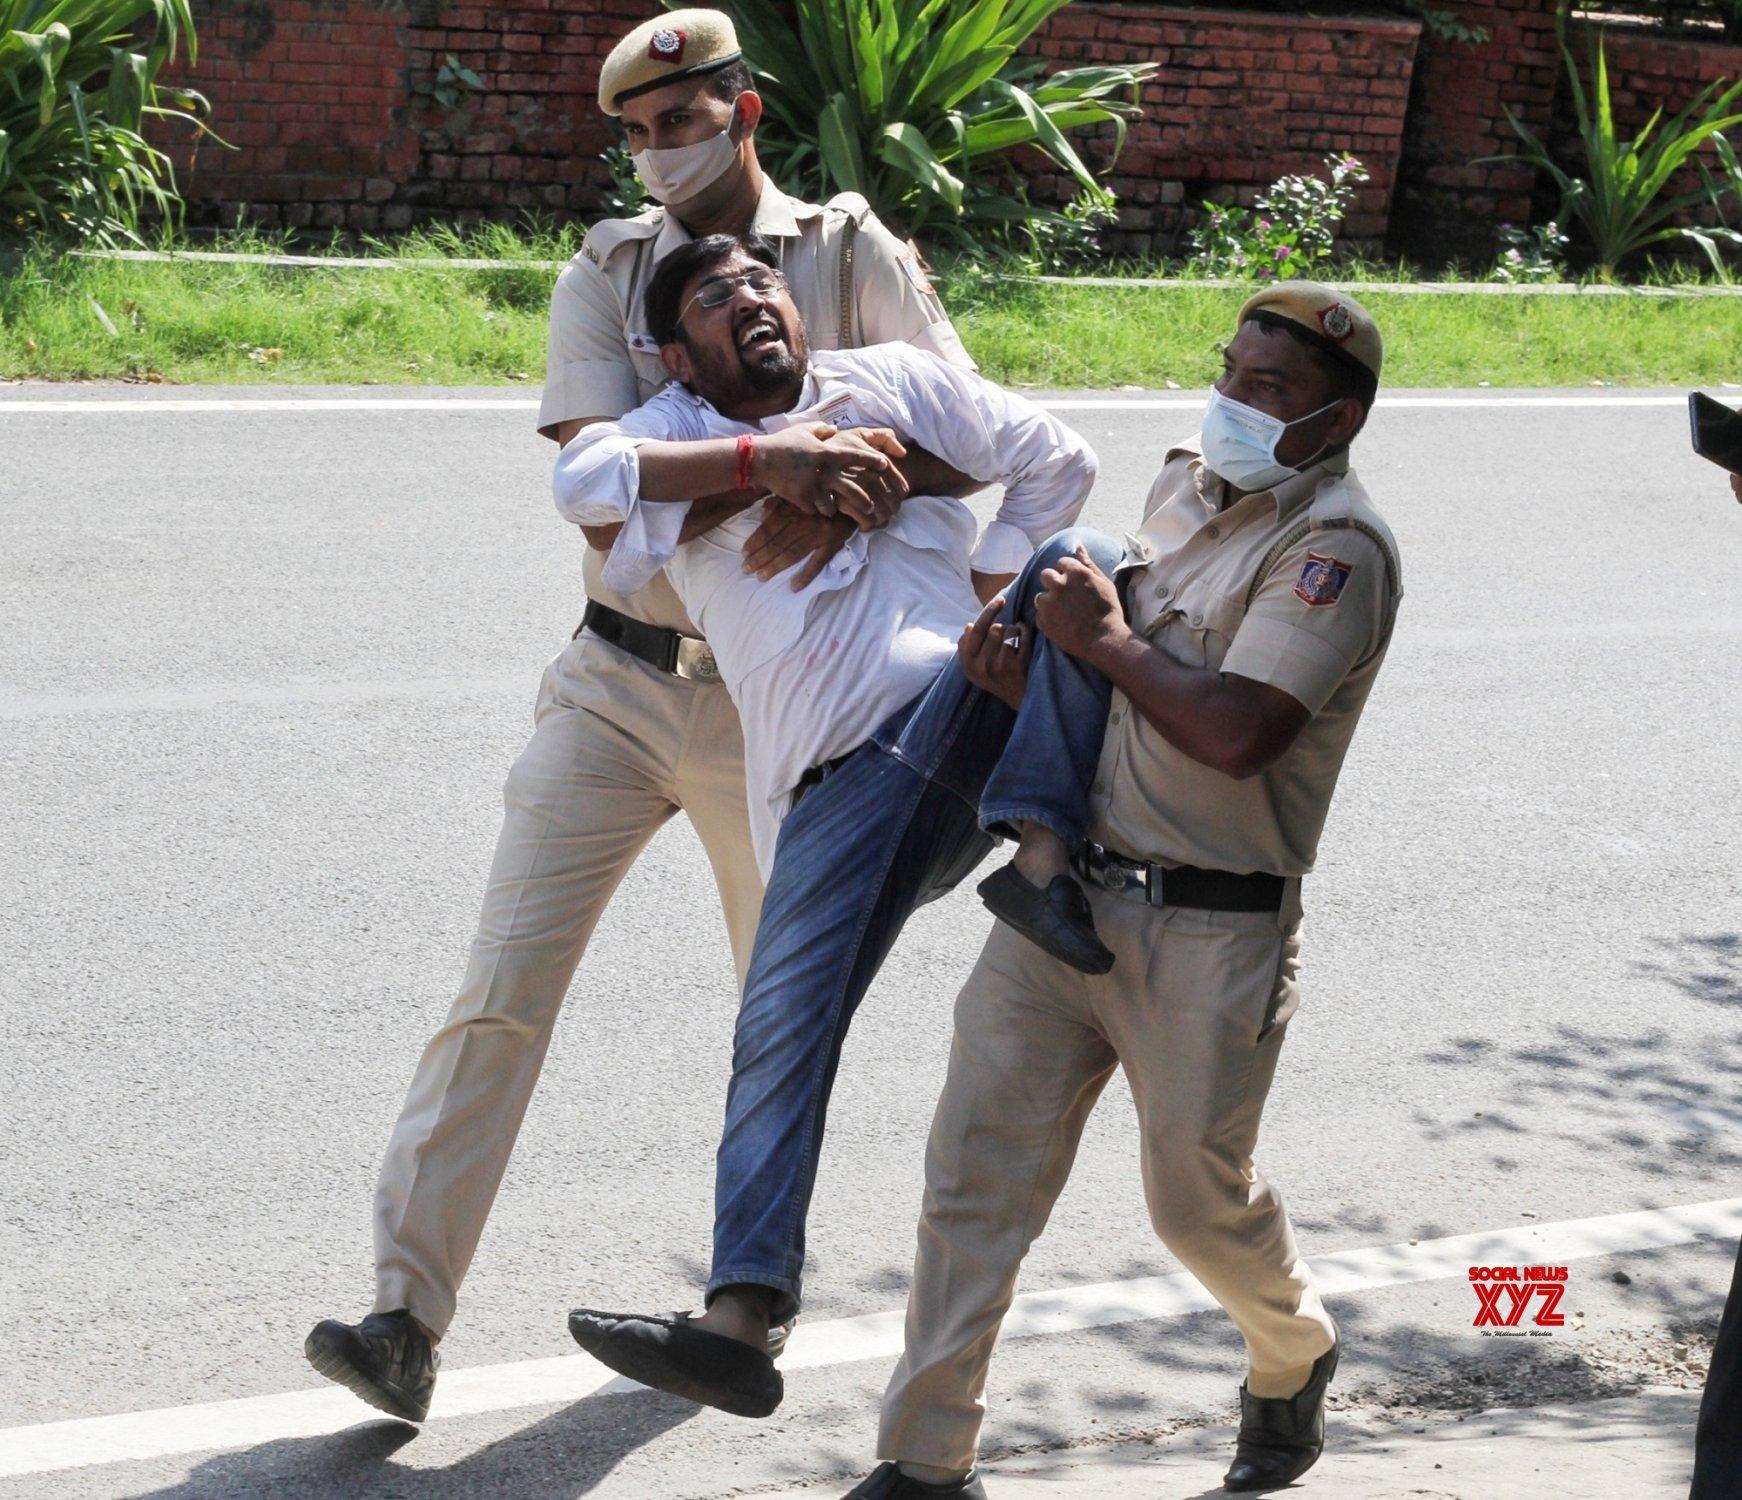 :Delhi police personnel detain a Youth Congress activist - protesting against Sunday's killing of four farmers in Uttar Pradesh Lakhimpur Kheri #Gallery